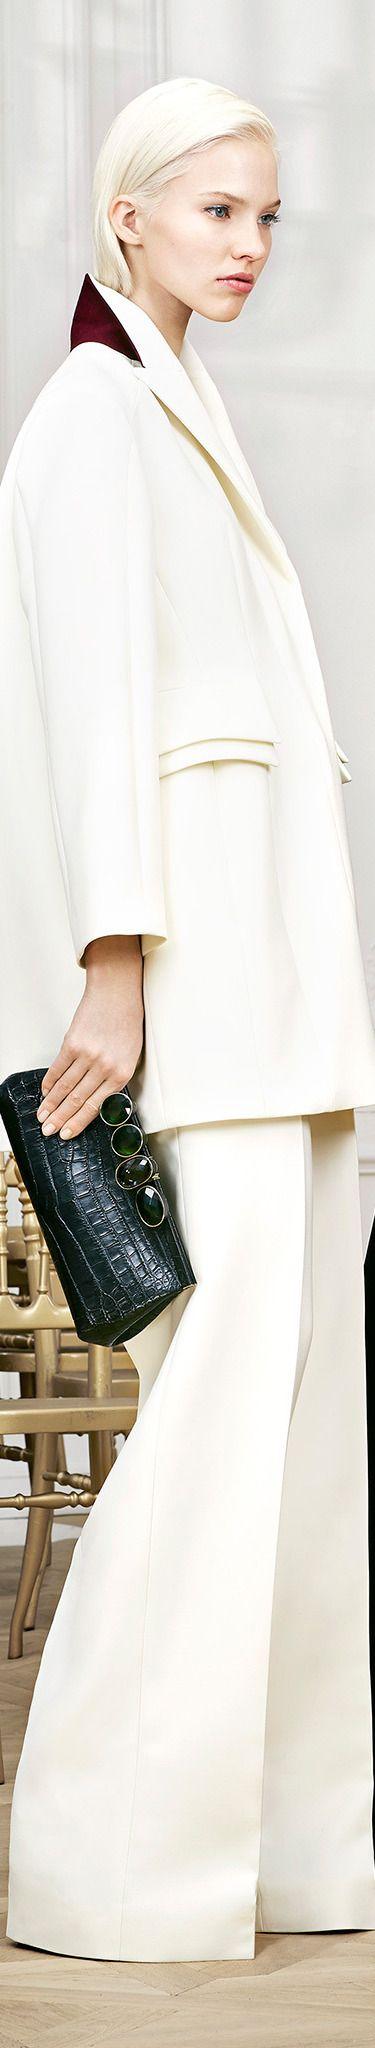 Executive suite / Boss Lady /karen cox...Christian Dior Pre-Fall 2014